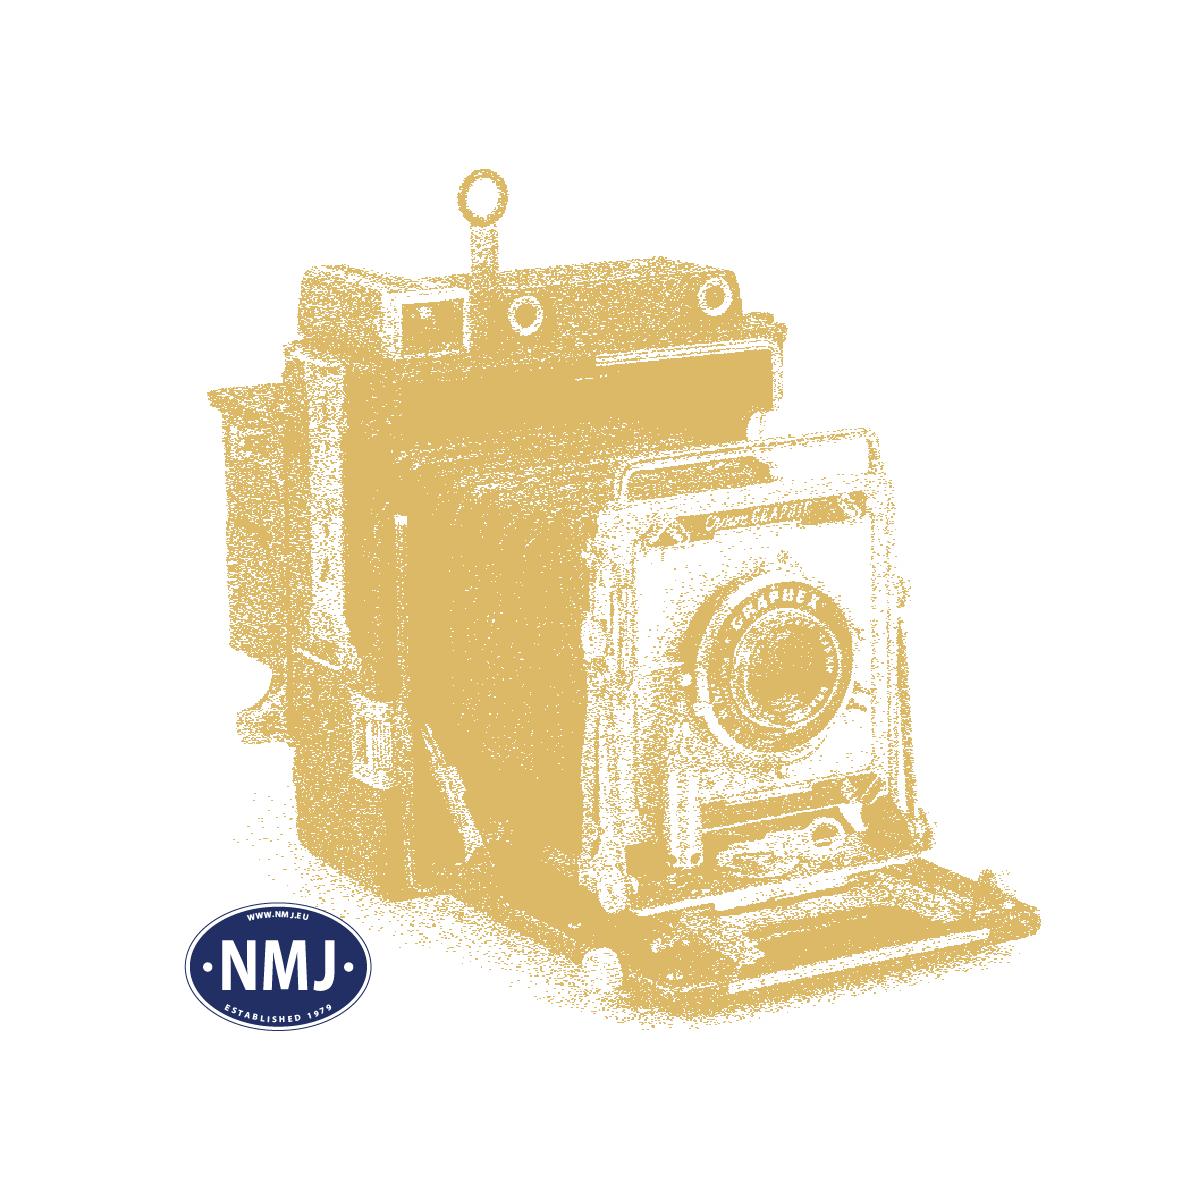 NMJT87.201AC - NMJ Topline NSB El11b.2148, Gammeldesign, AC Digital